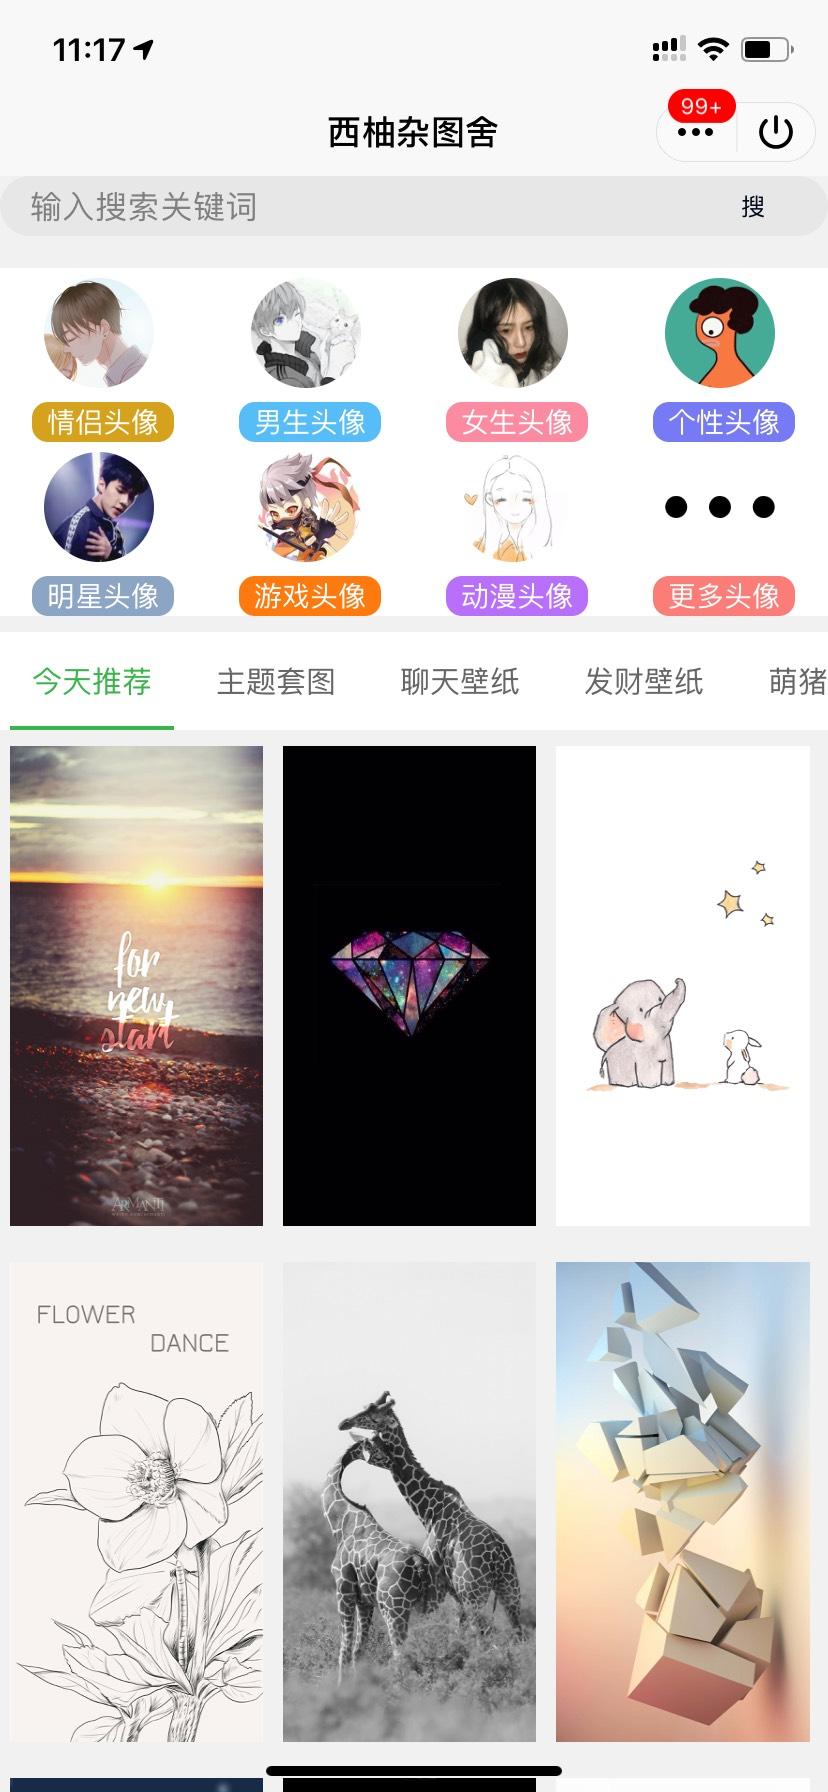 【QQ小程序】西柚杂图舍 好看的手机壁纸头像